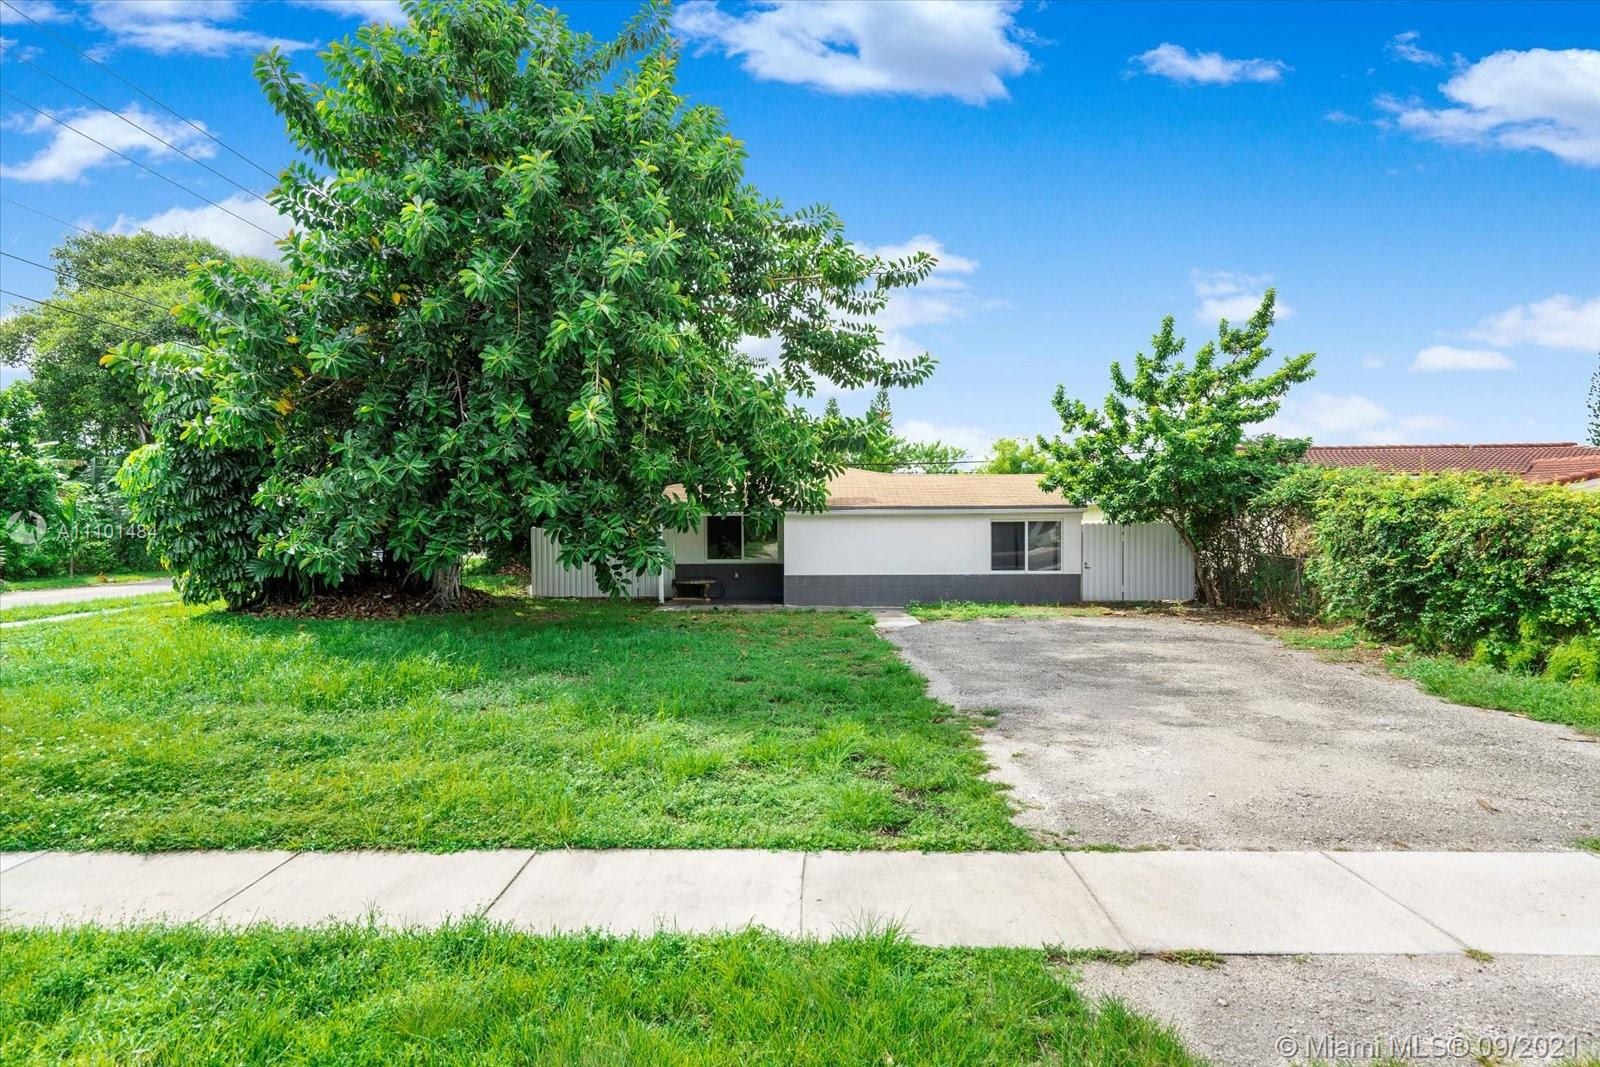 Single Family Home,For Sale,1698 NE 176th St, North Miami Beach, Florida 33162,Brickell,realty,broker,condos near me